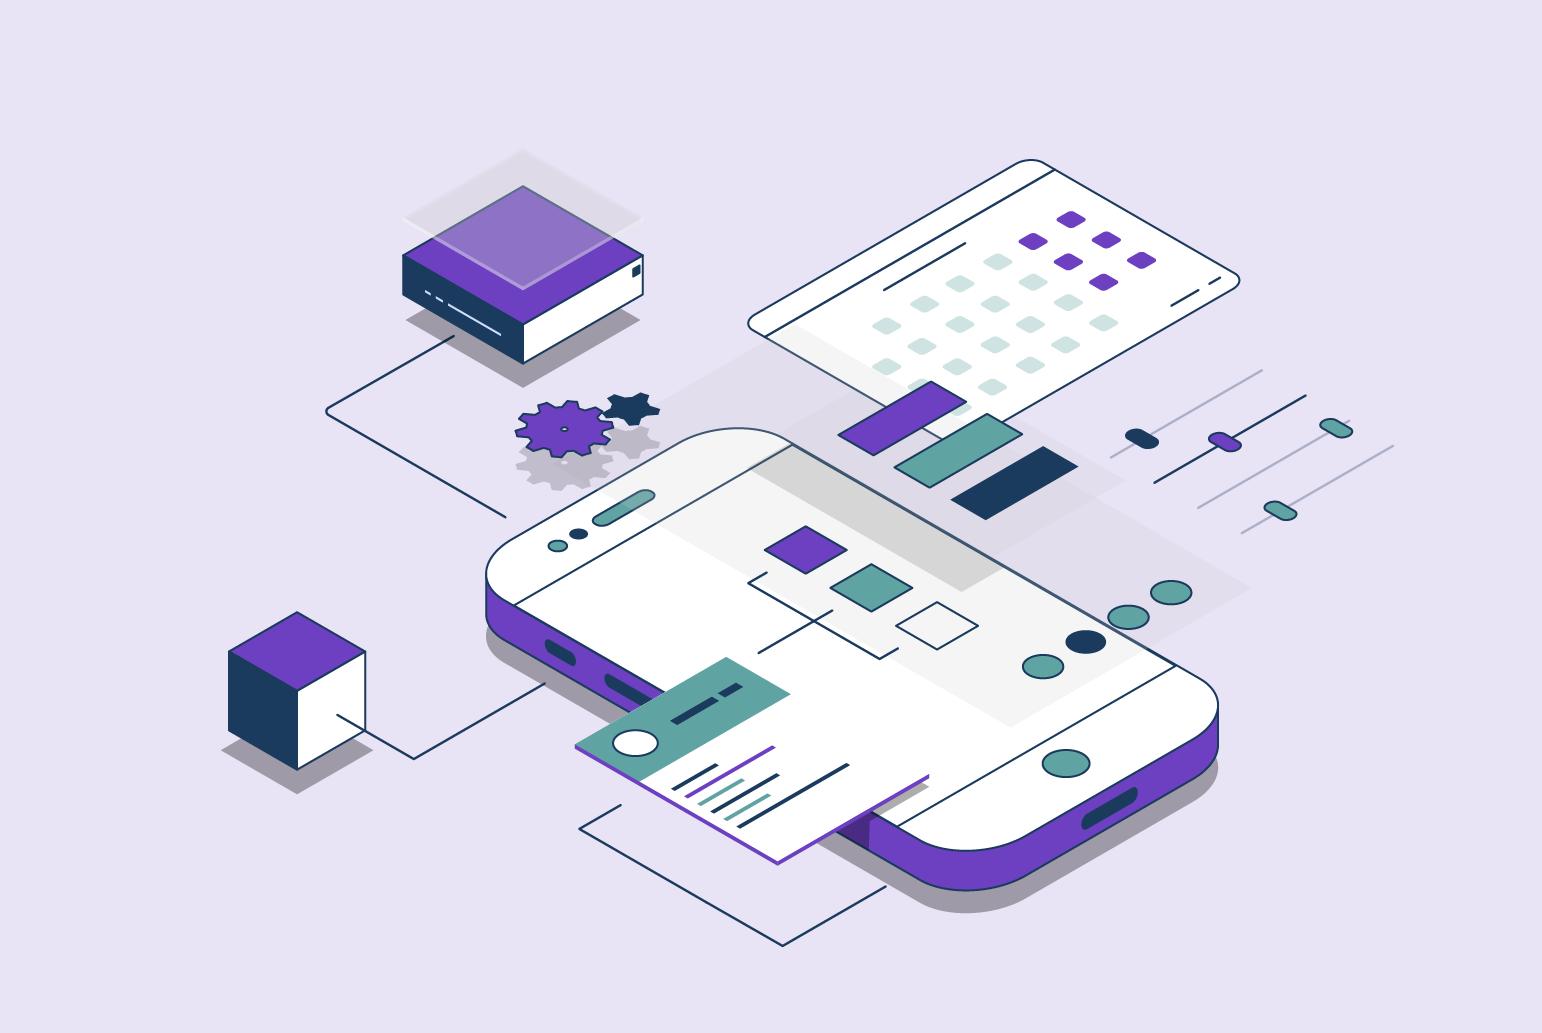 Platforms graphic - designed by Sonja Meyer